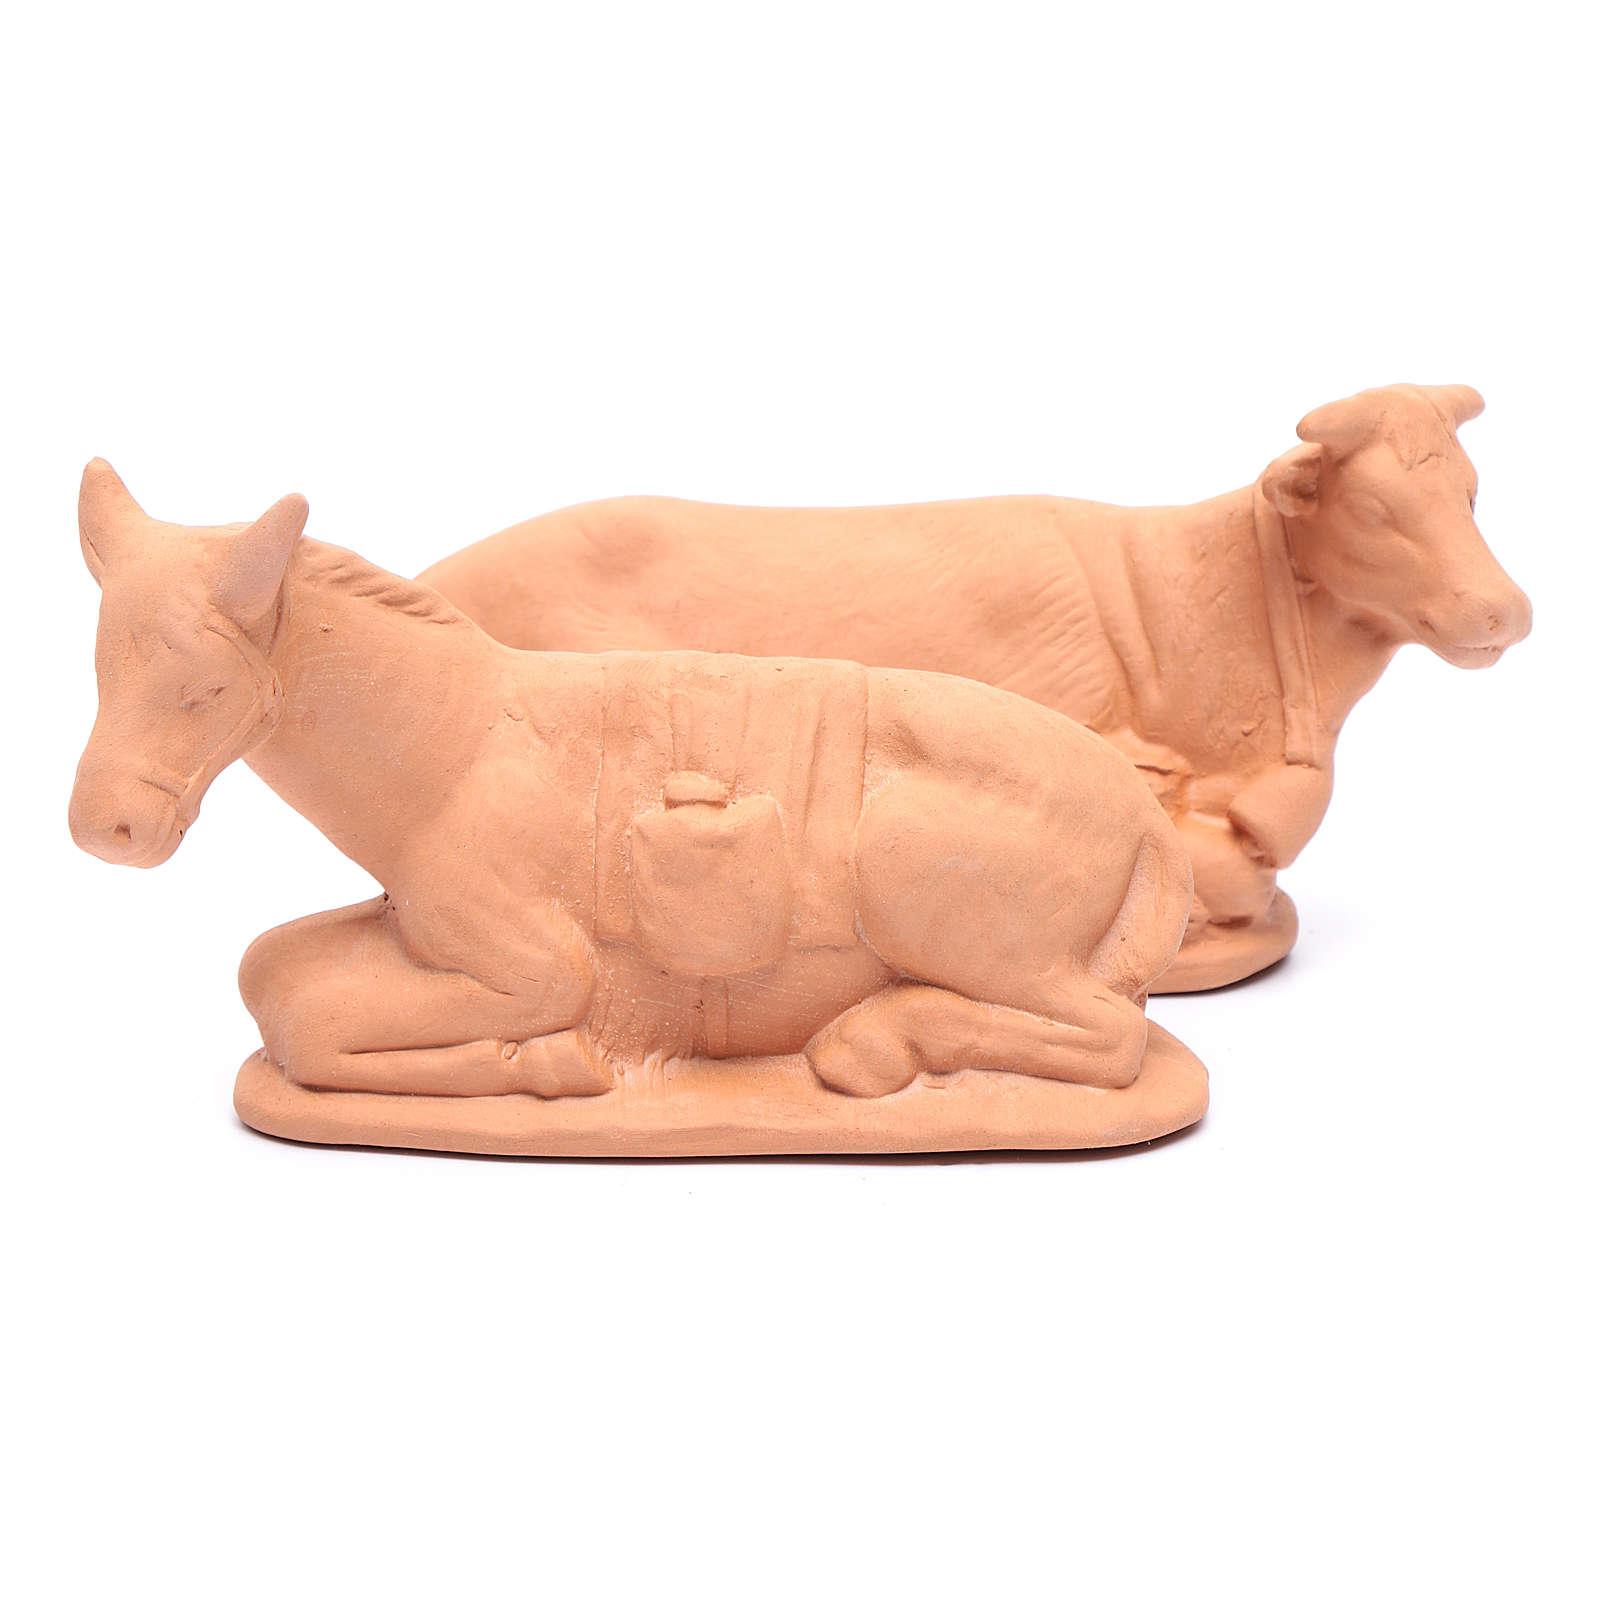 Presepe terracotta naturale 15 statuine 20 cm 4